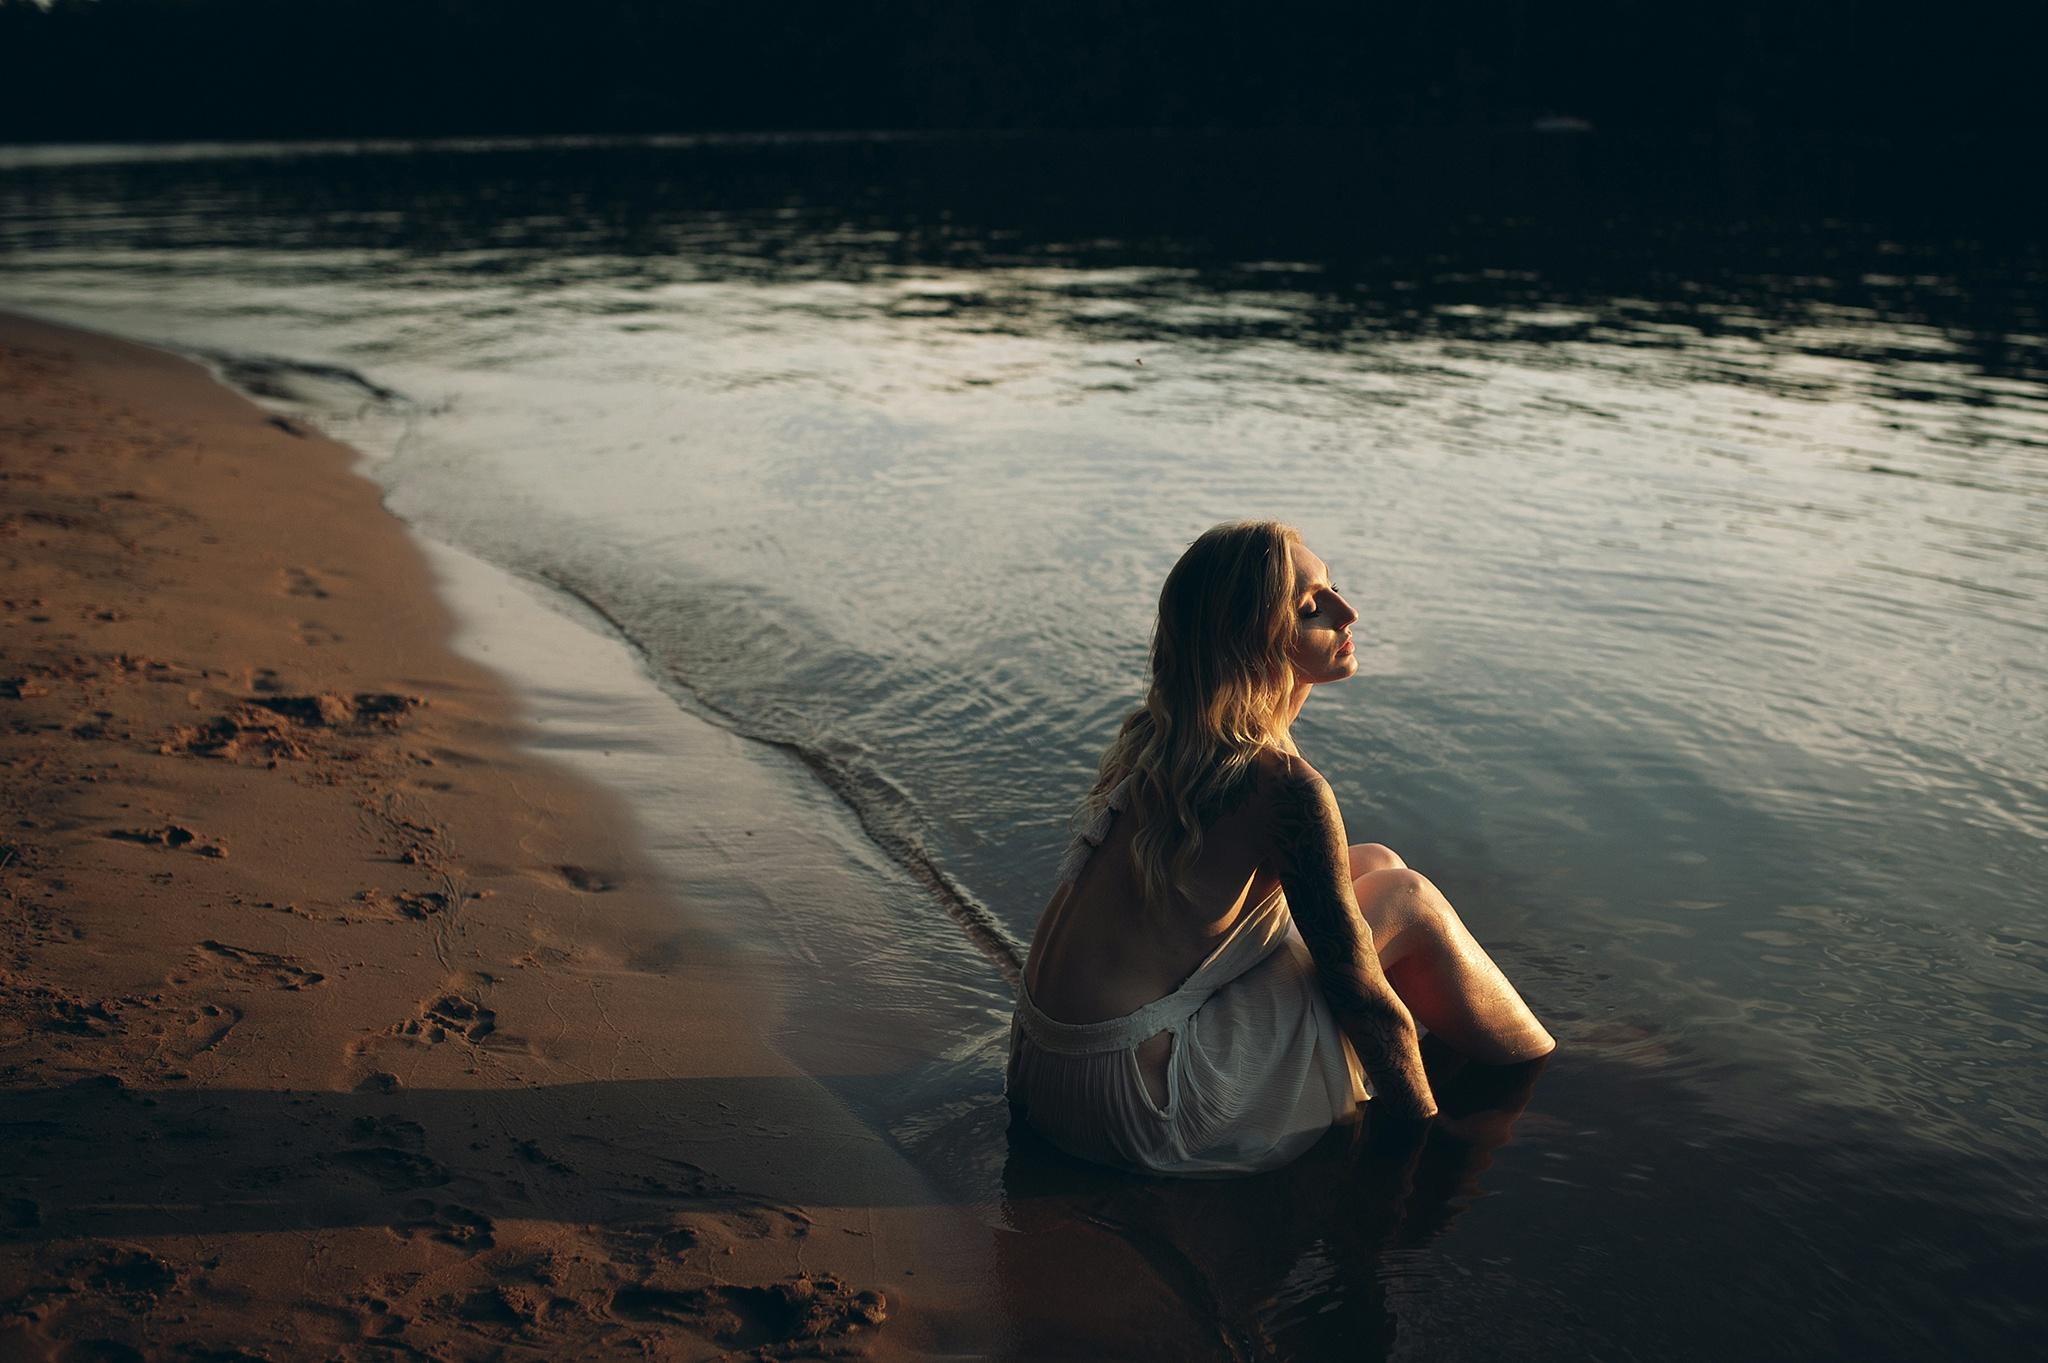 outdoor-boudoir-photographer-water_16.jpg